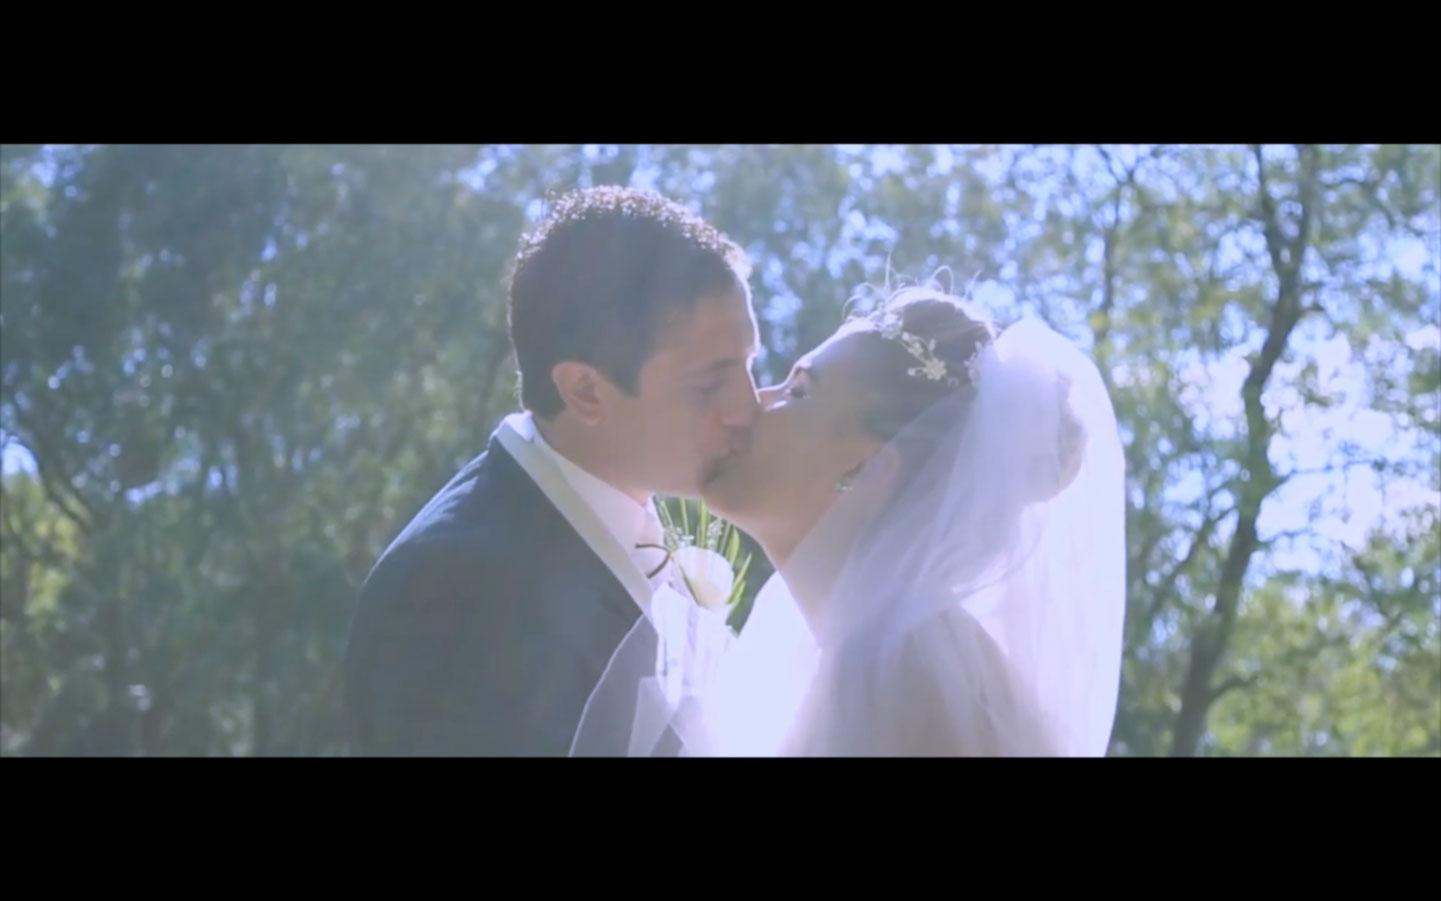 Mariage à marseille, Catherine et Nicolas